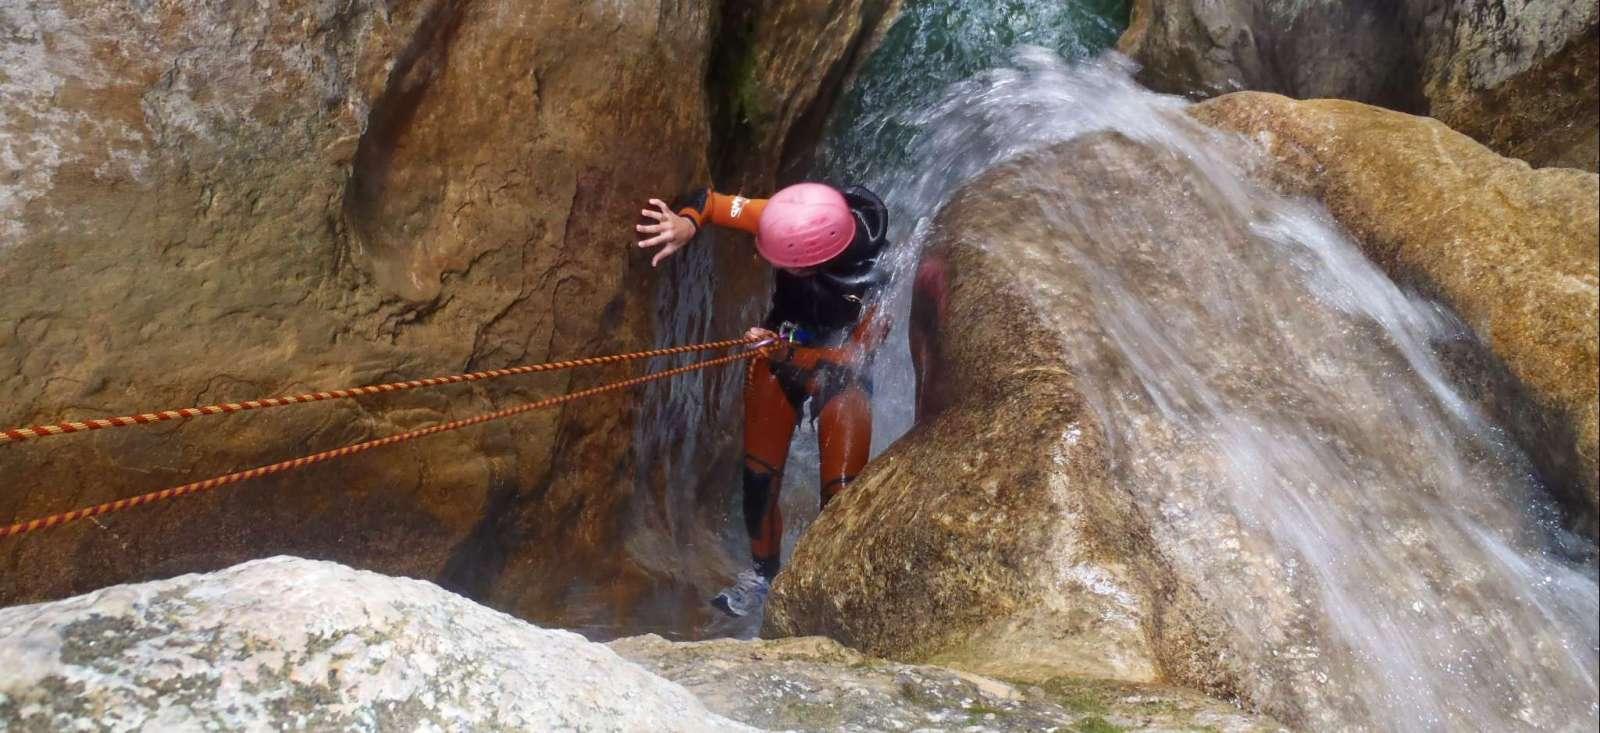 Voyage sur l'eau : Canyoning en Sierra de Guara (version camping)